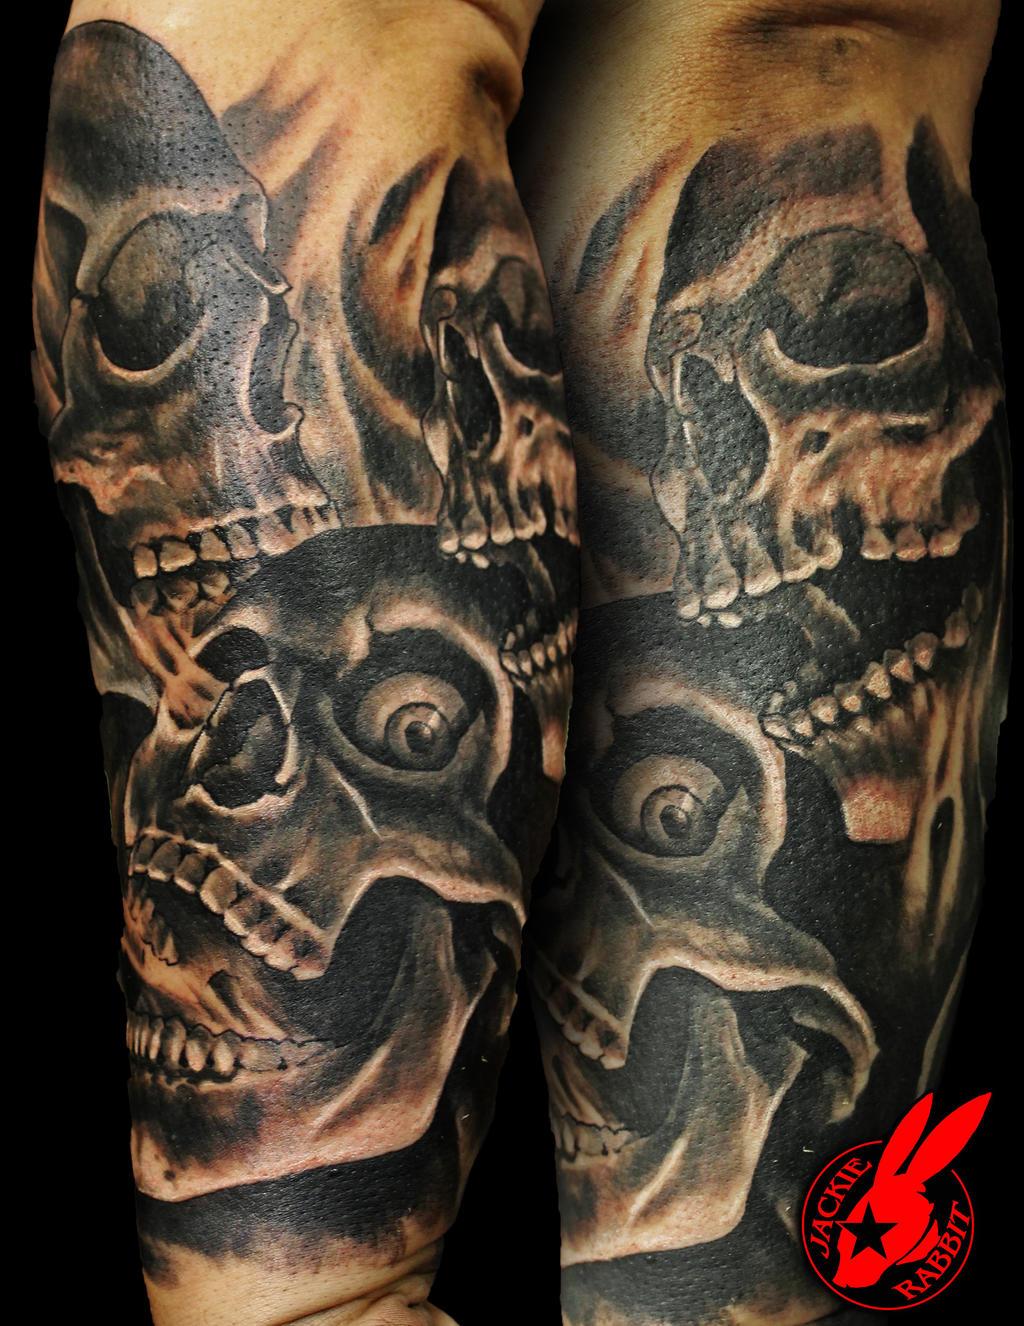 Skulls And Smoke Tattoo Sleeve - Interior Home Design